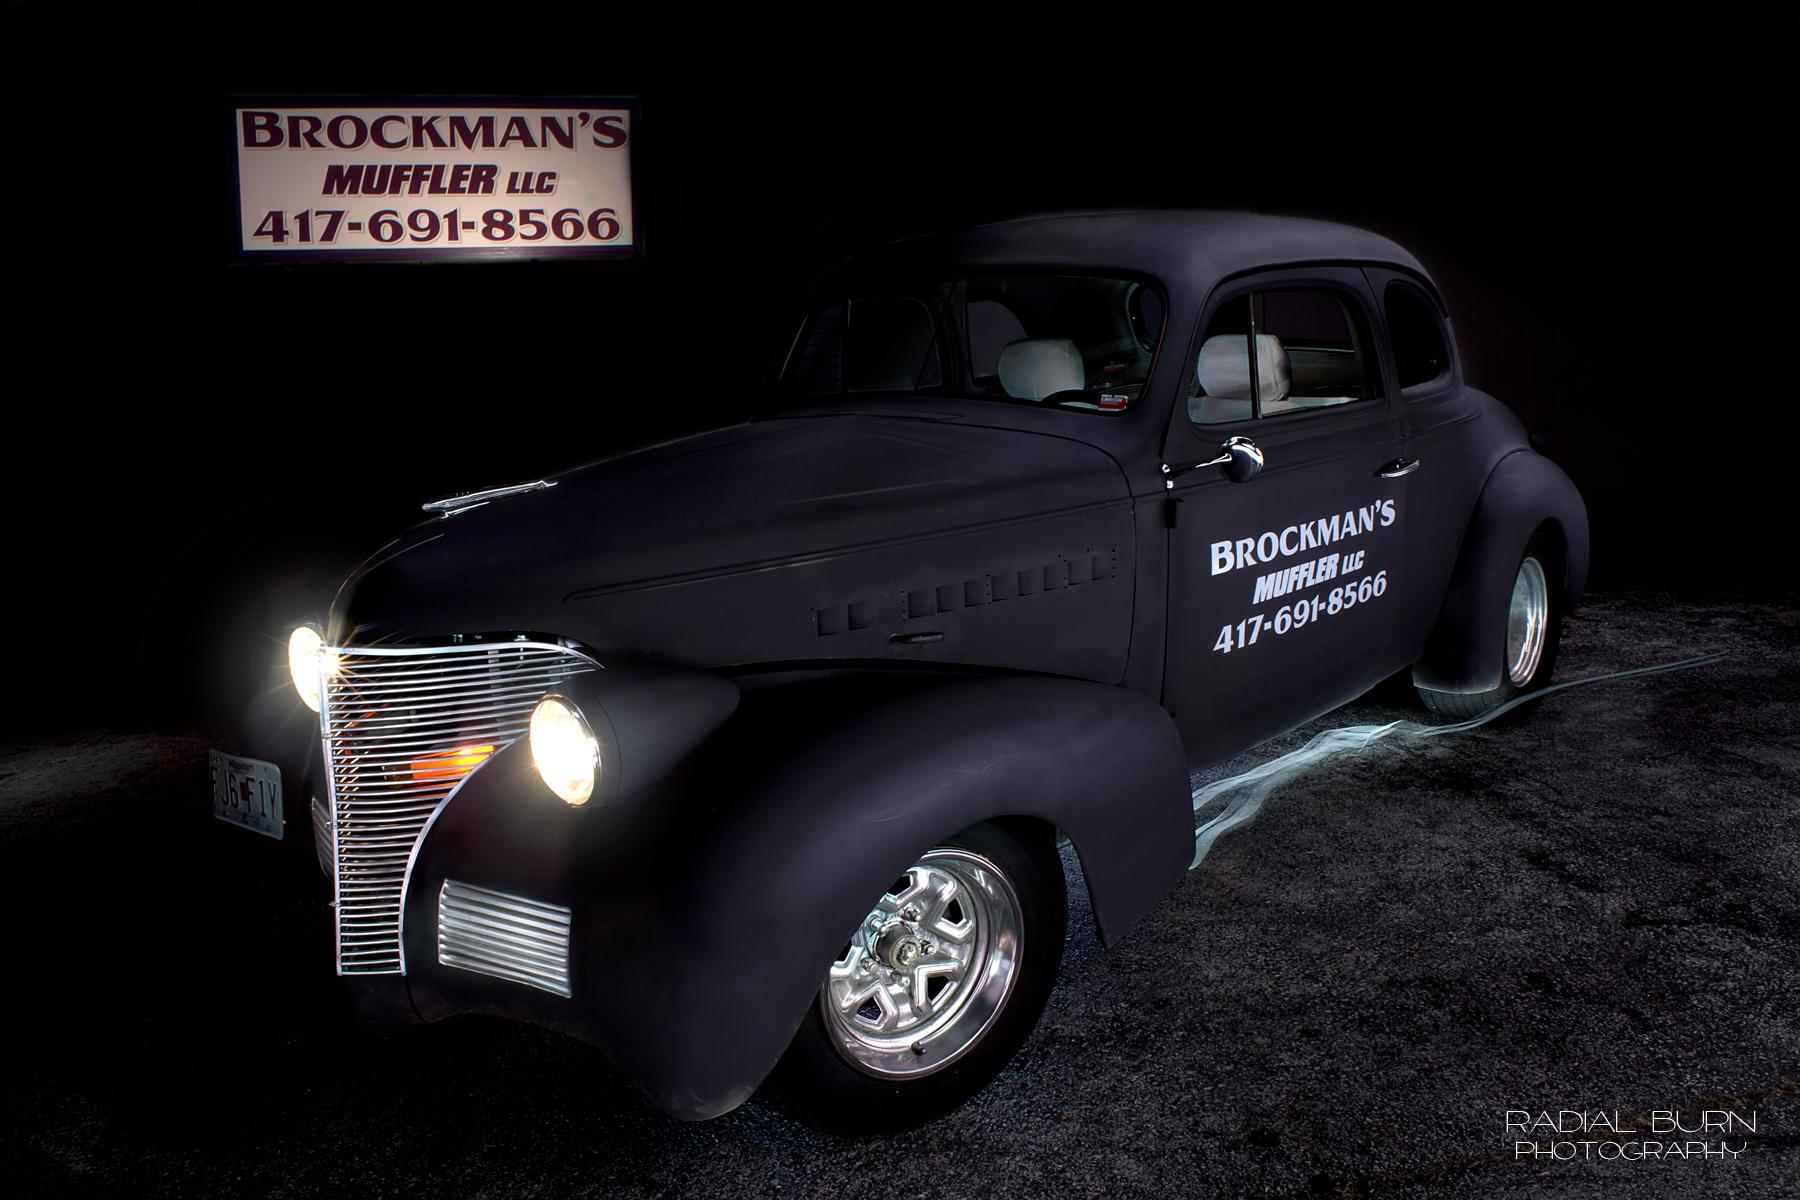 Brockman's Muffler image 38